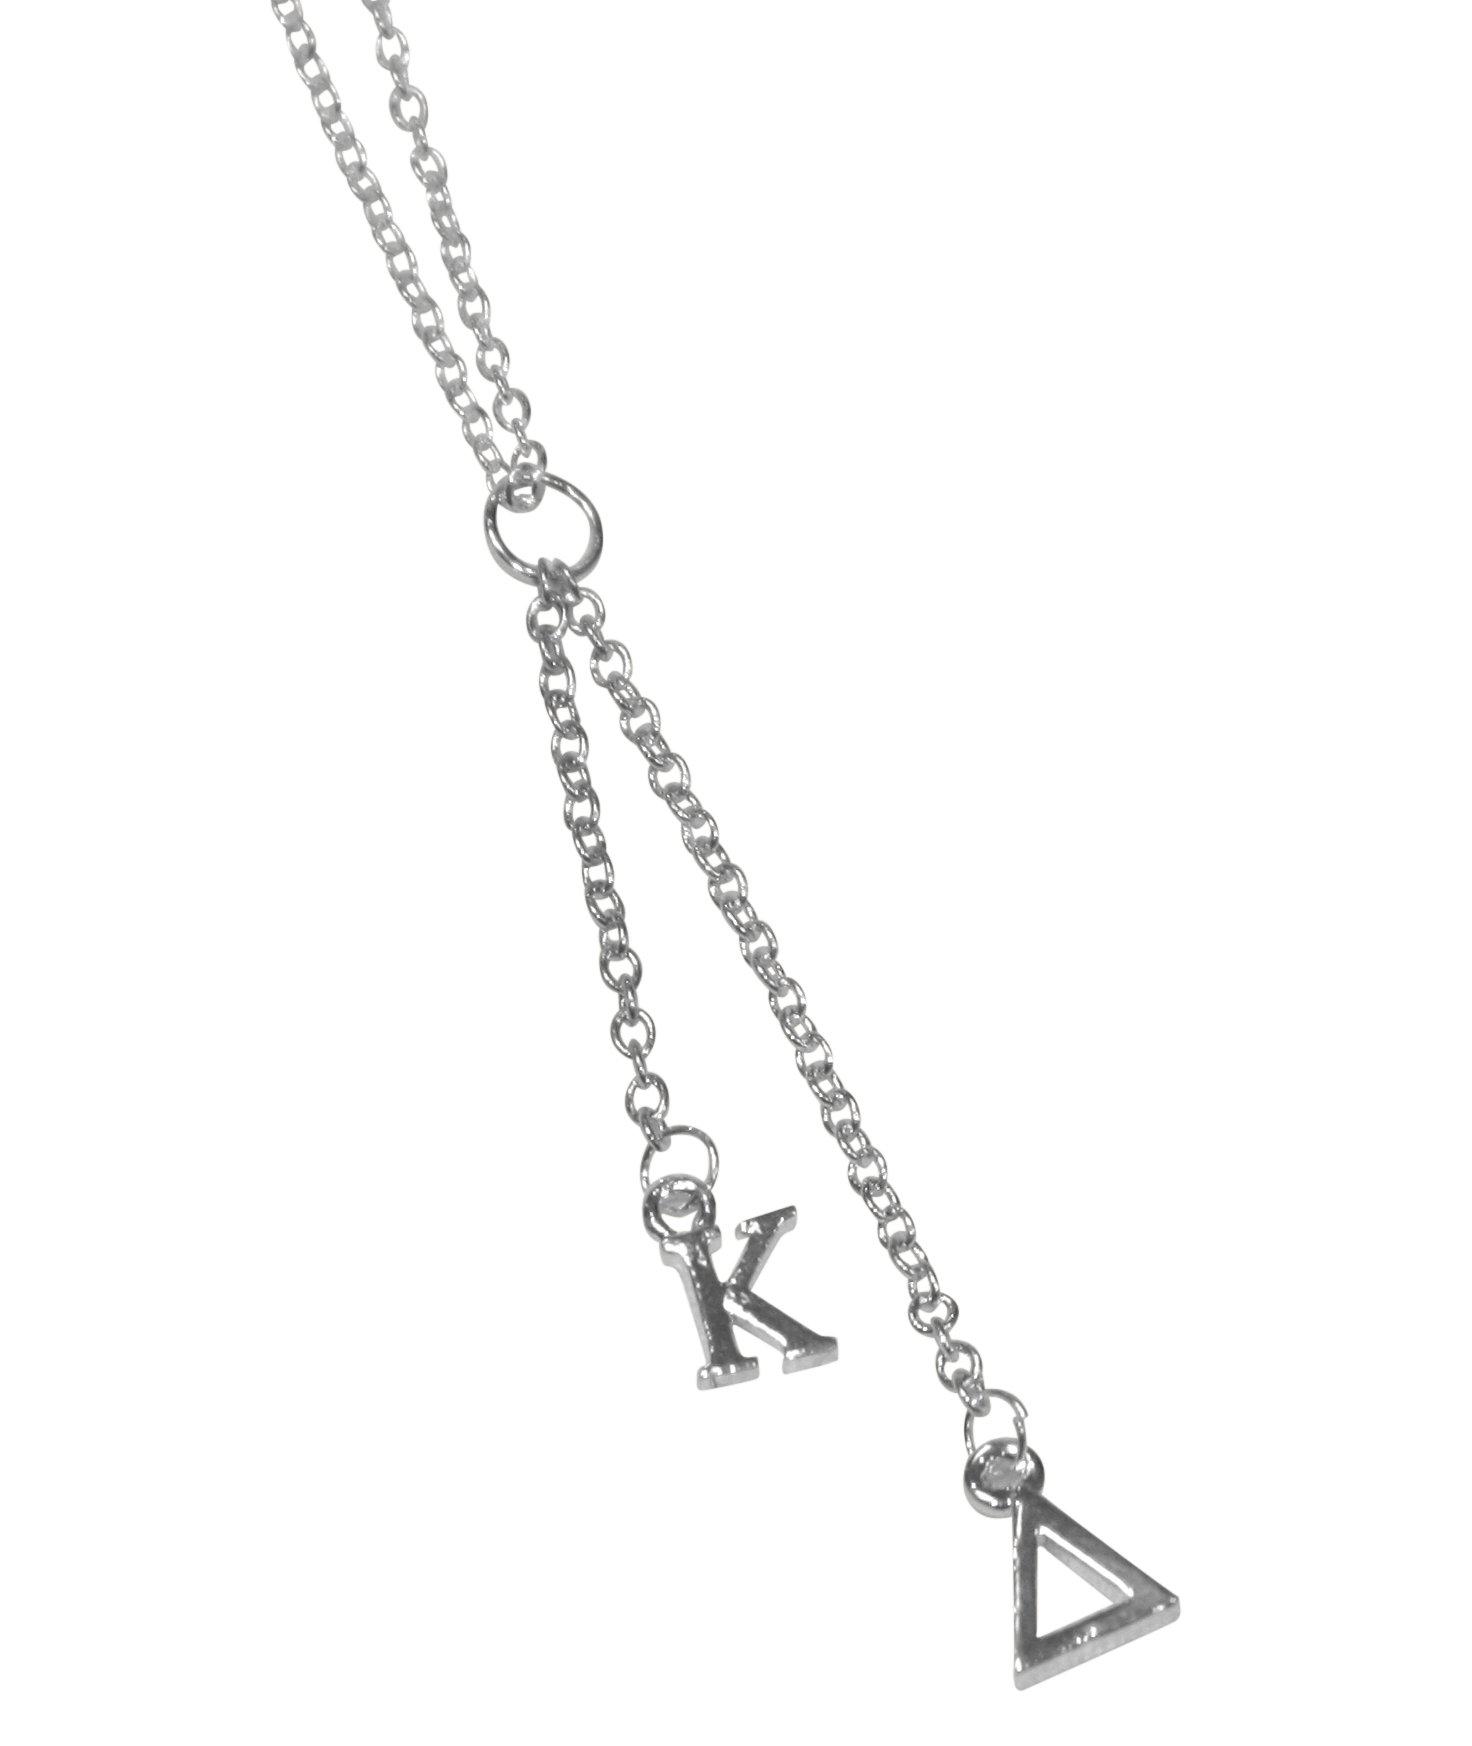 Kappa Delta Sorority Silver Dangle Necklace